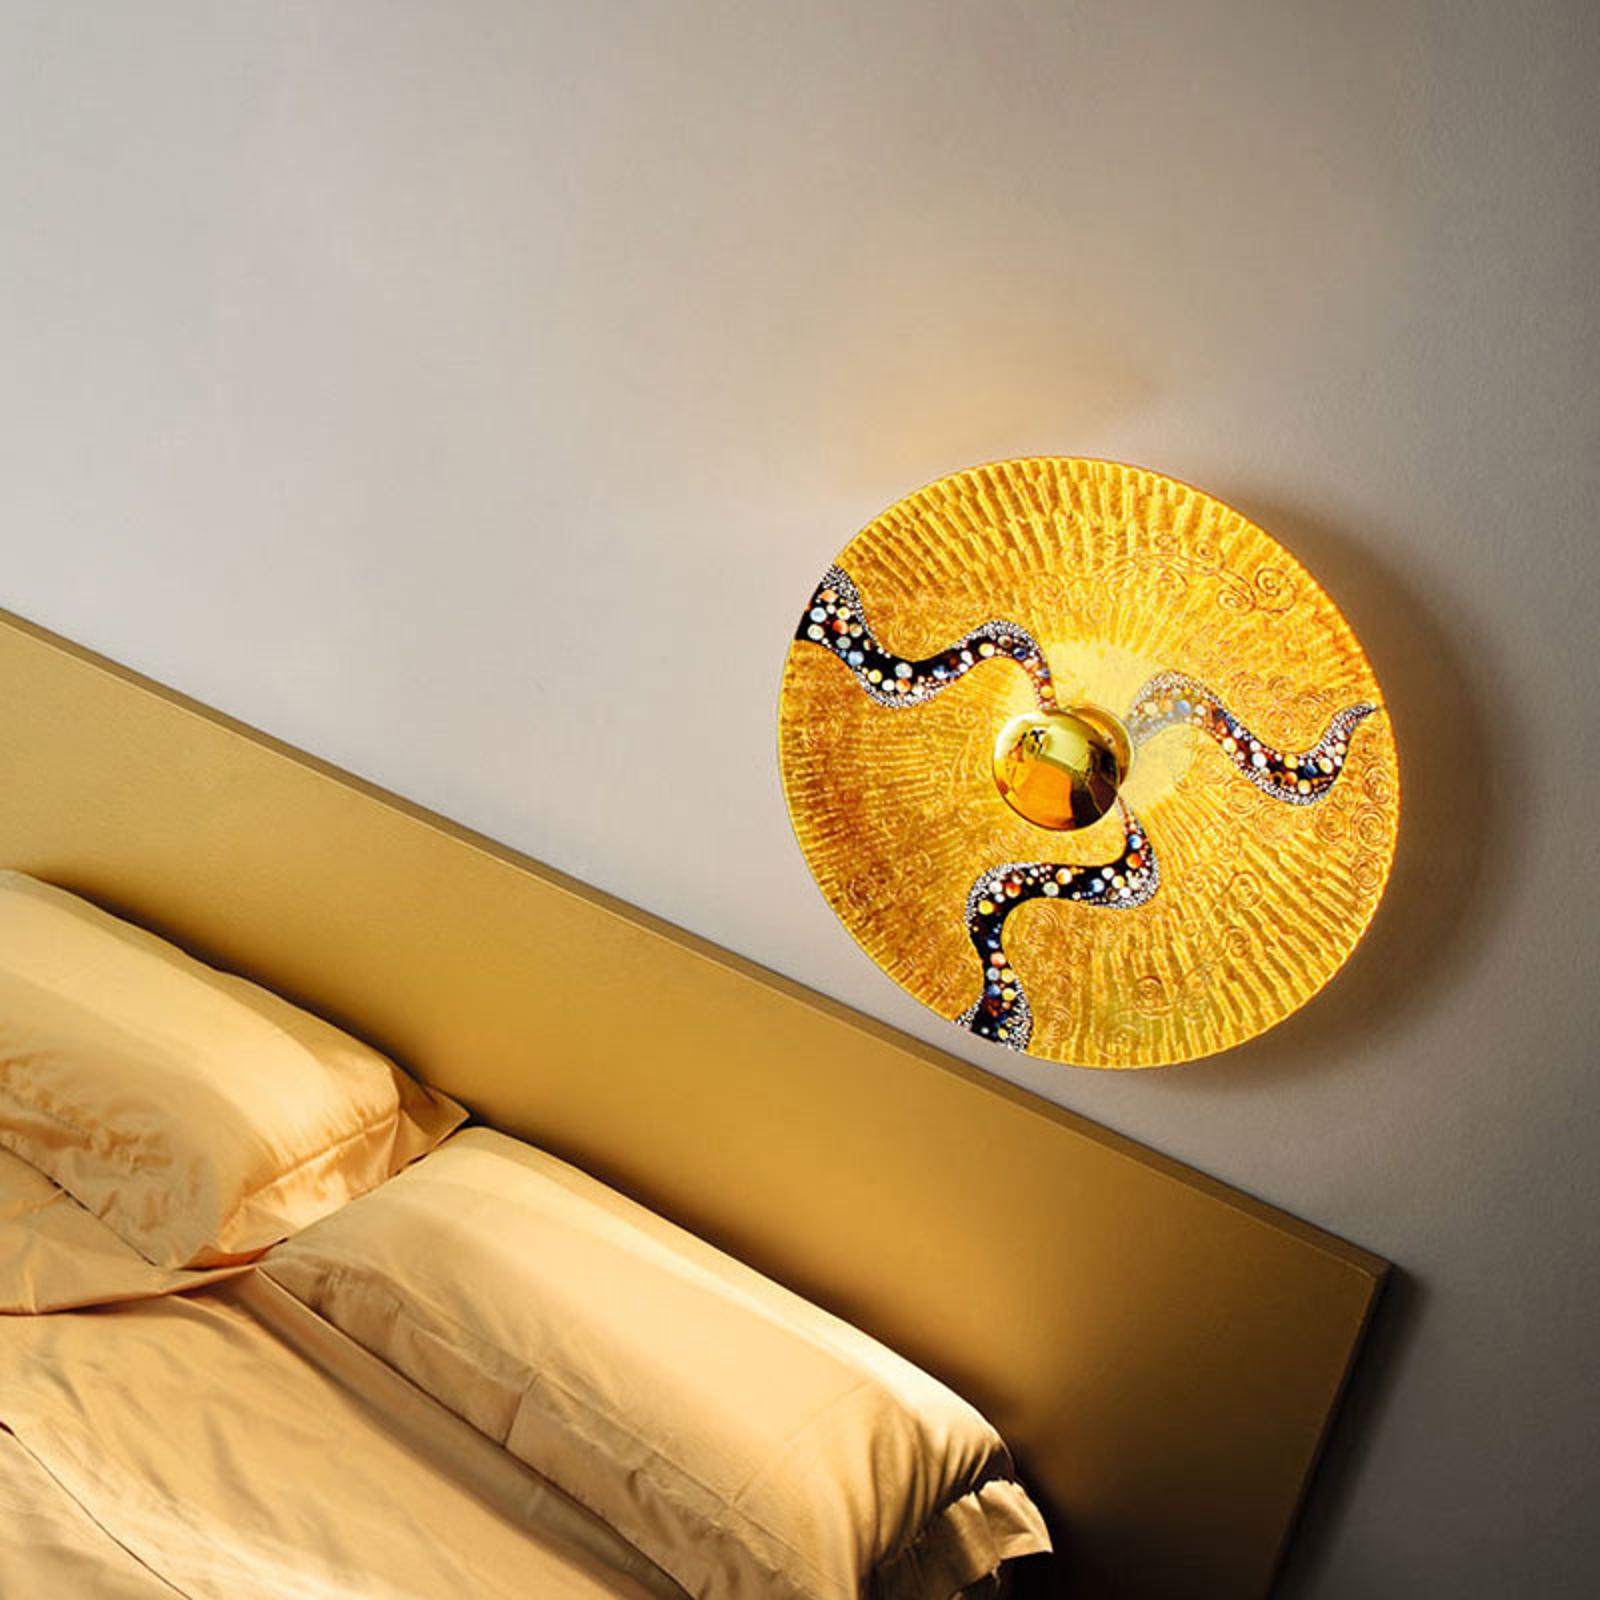 KOLARZ Luna Kiss Gold væglampe, 24 kt, Ø 54 cm